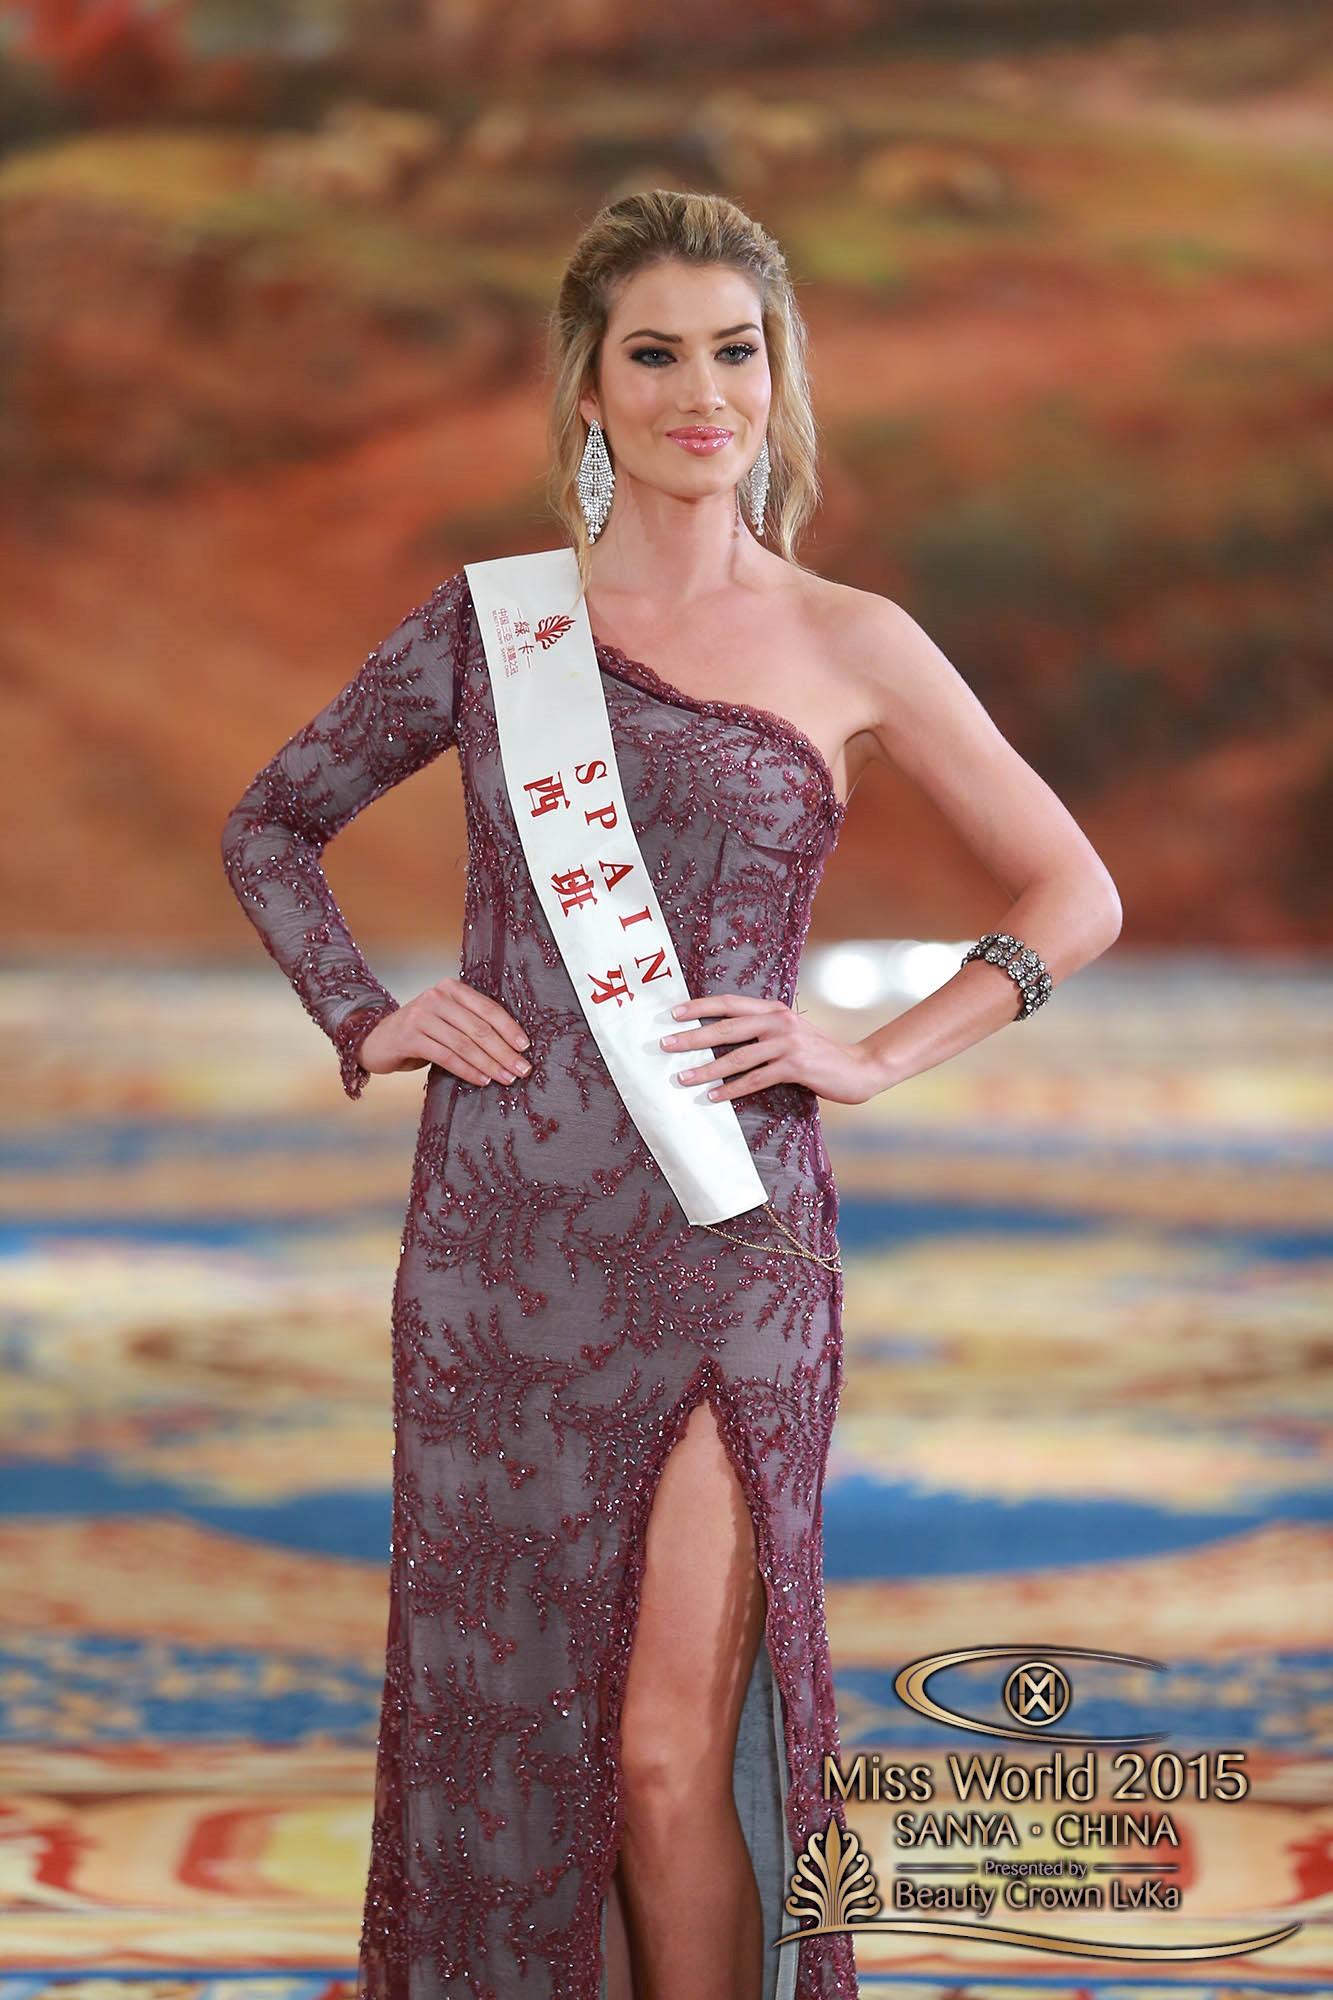 mireia lalaguna, miss world 2015. - Página 2 340e5610